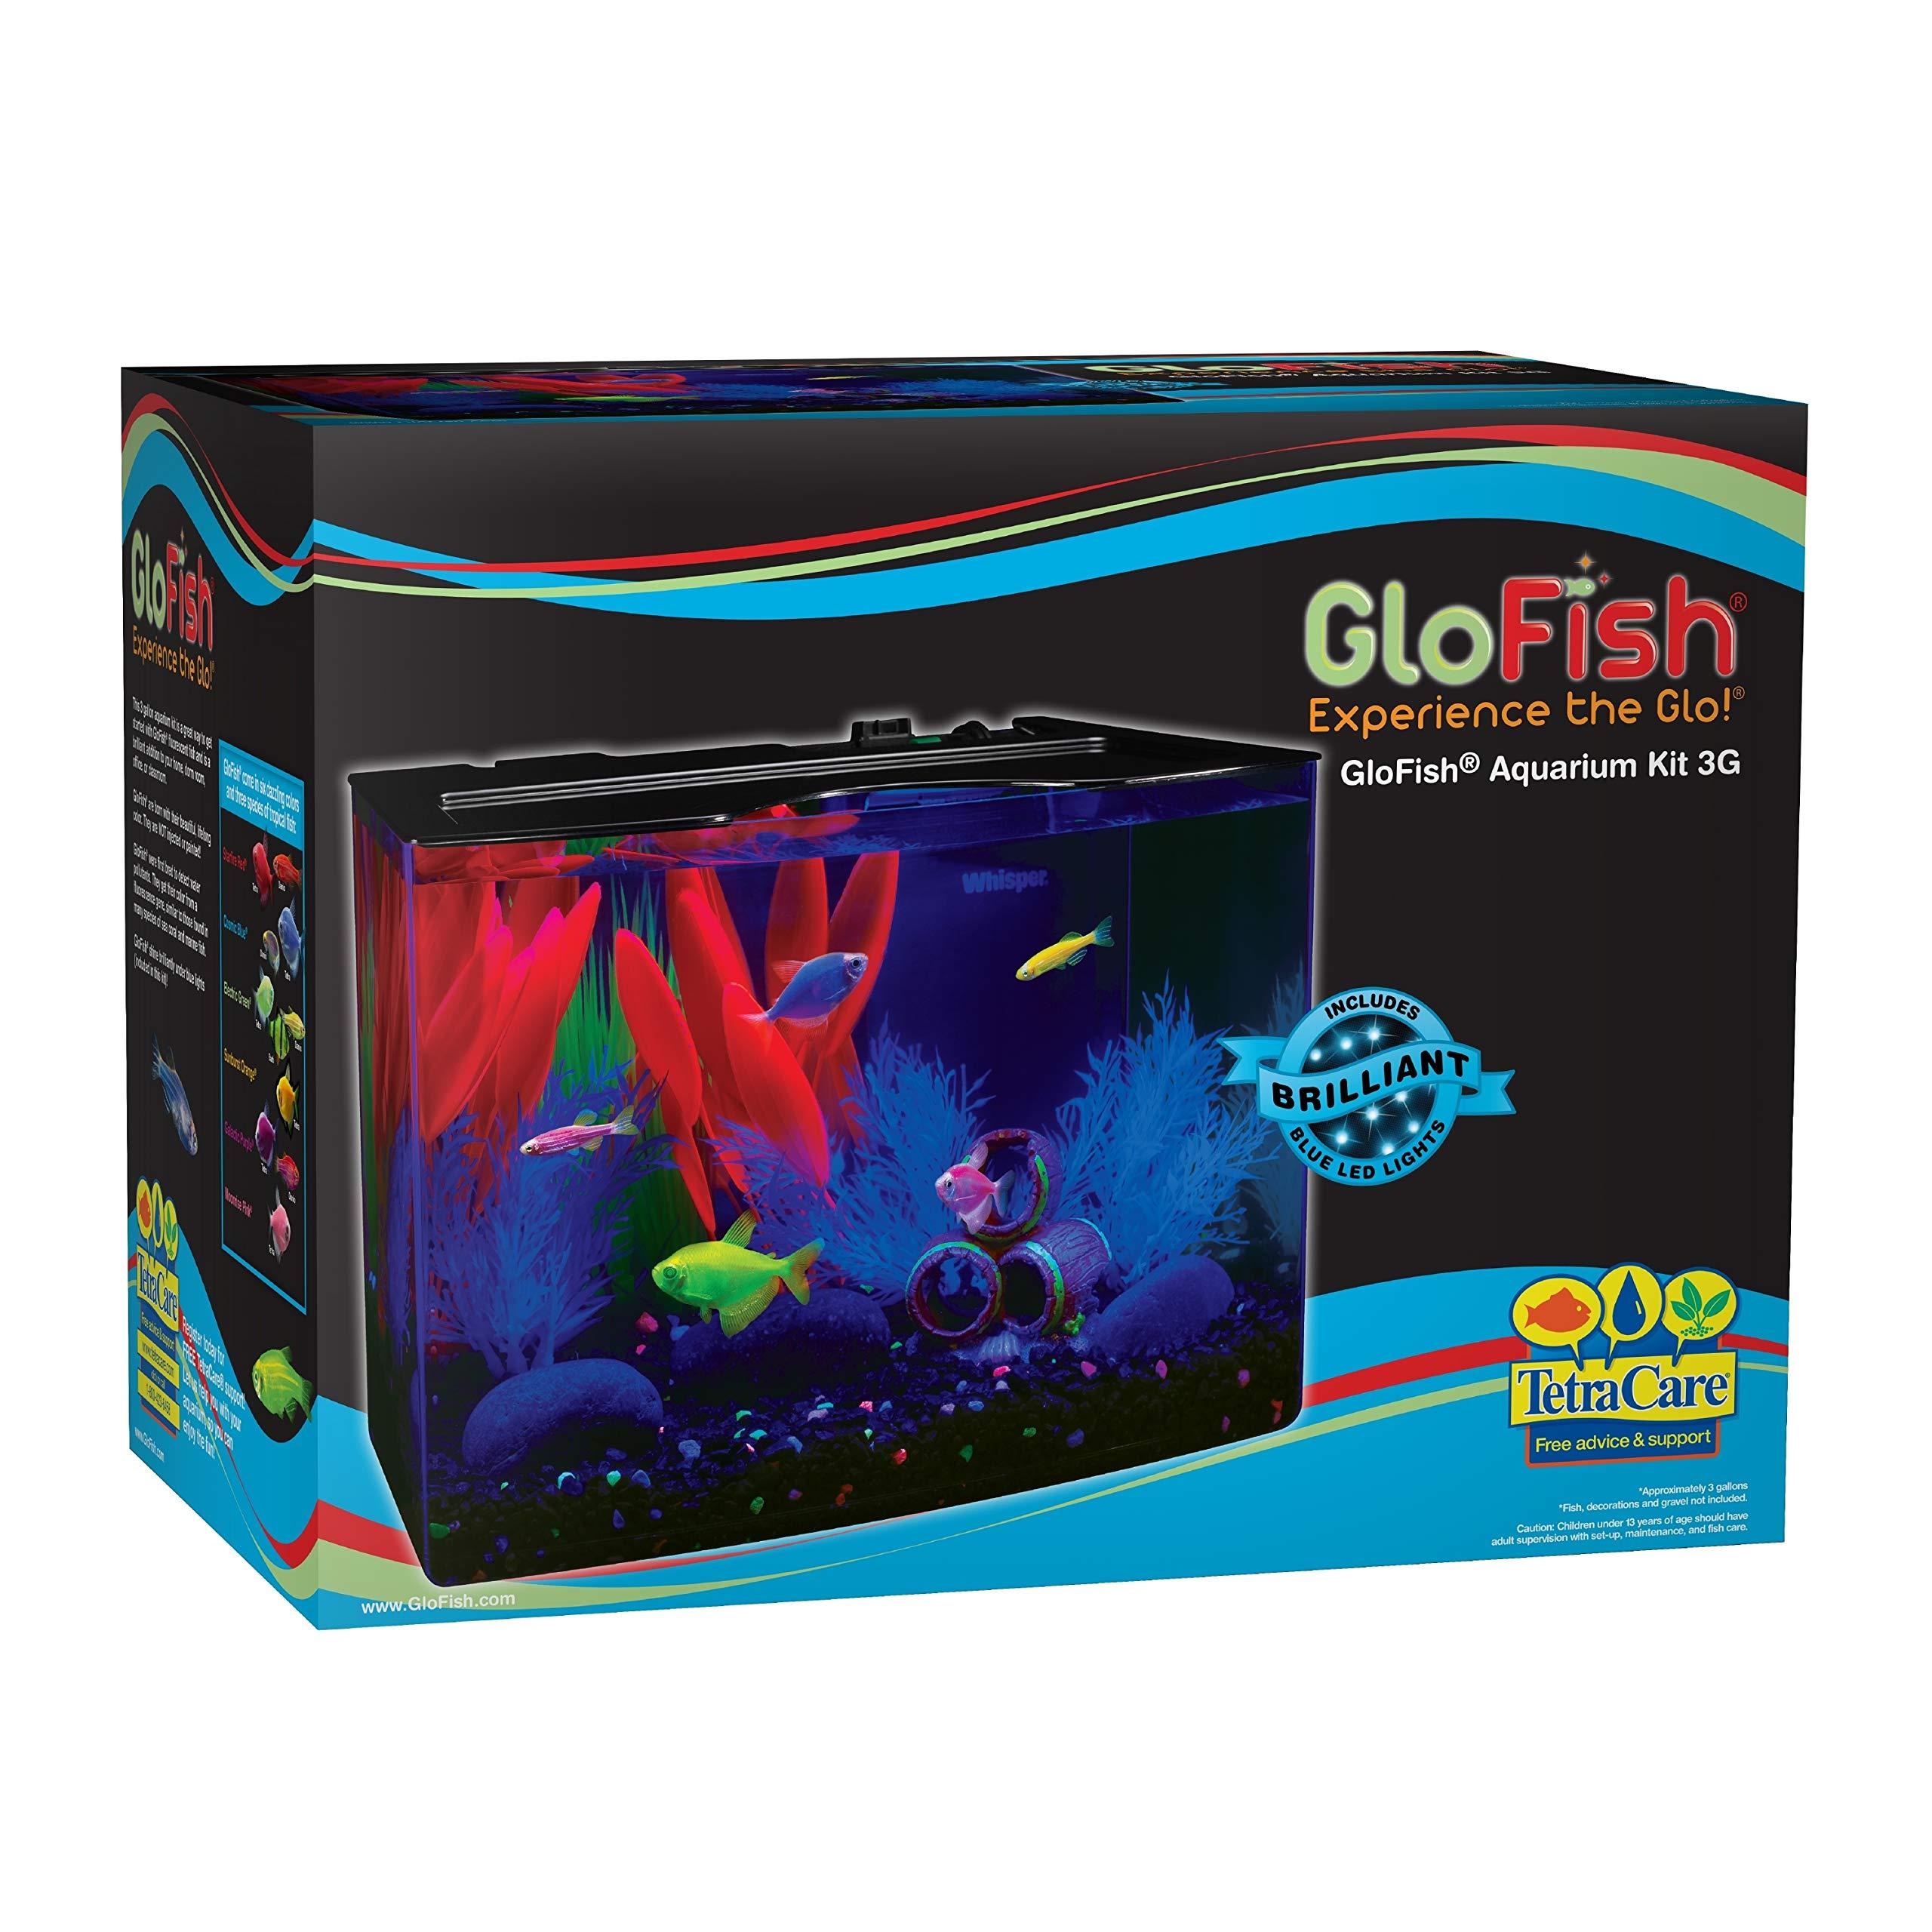 GloFish 3 Gallon Aquarium Kit w/ Cover, Frame, LEDs, Power & Filter by GloFish